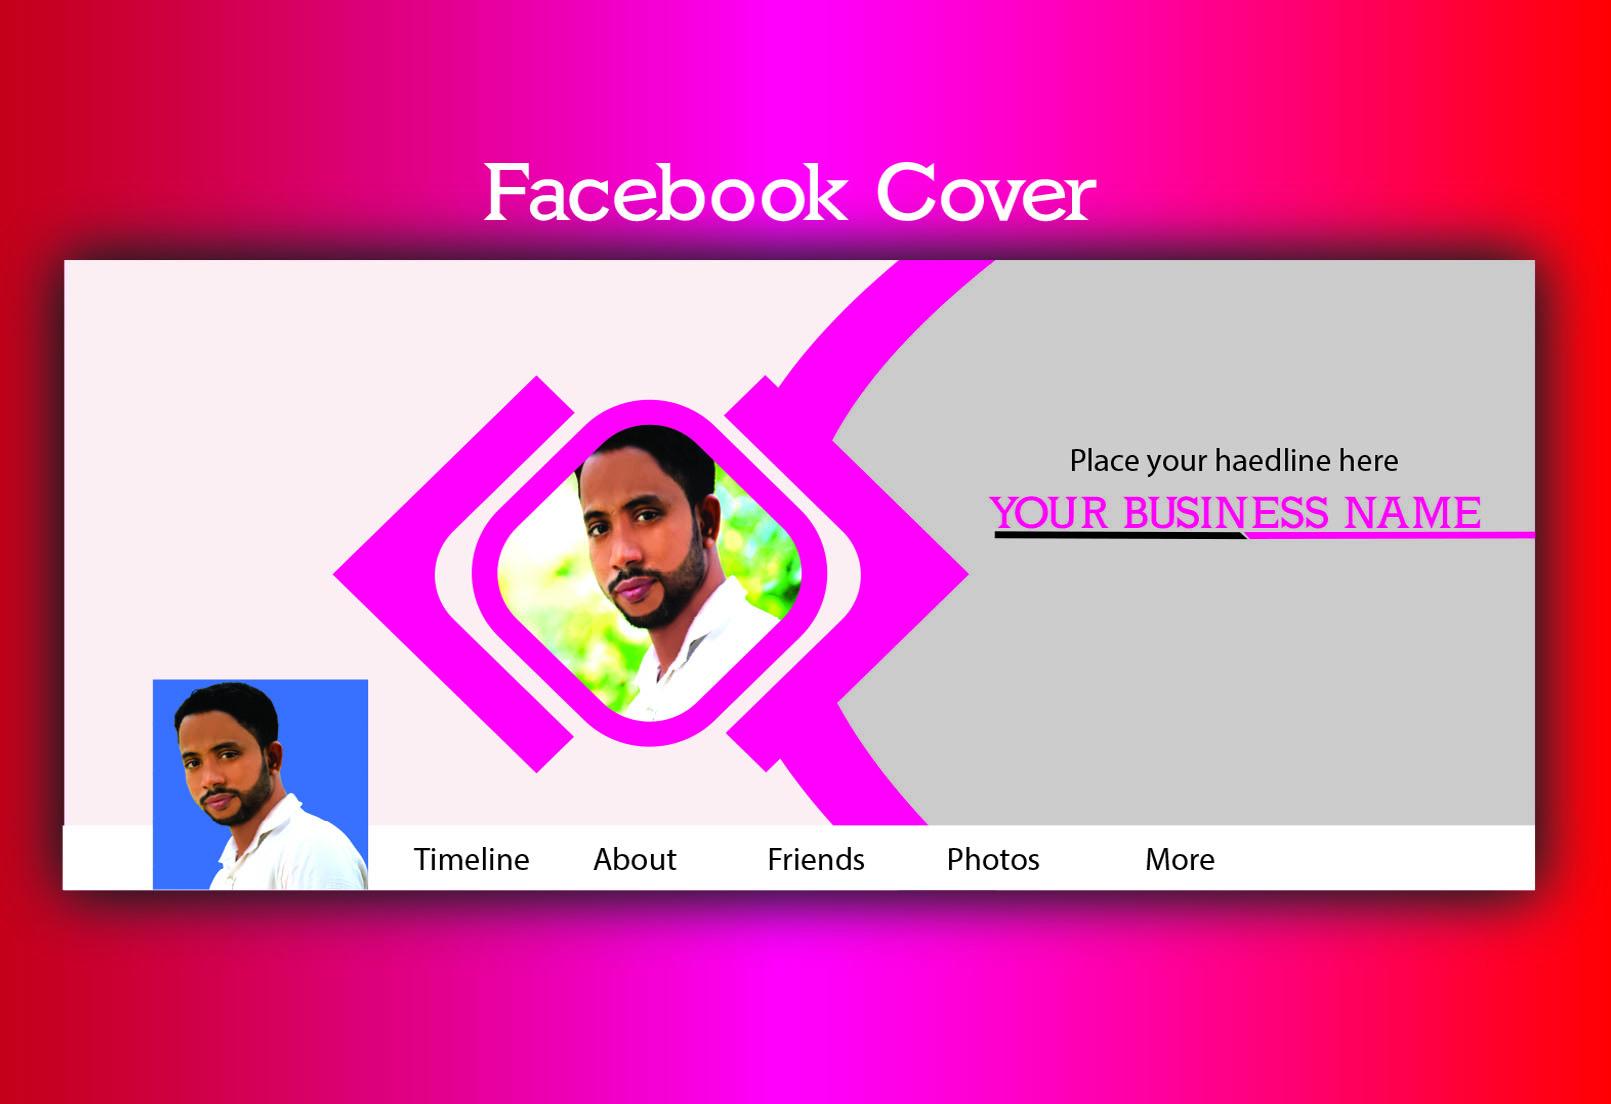 I will design professional Facebook cover